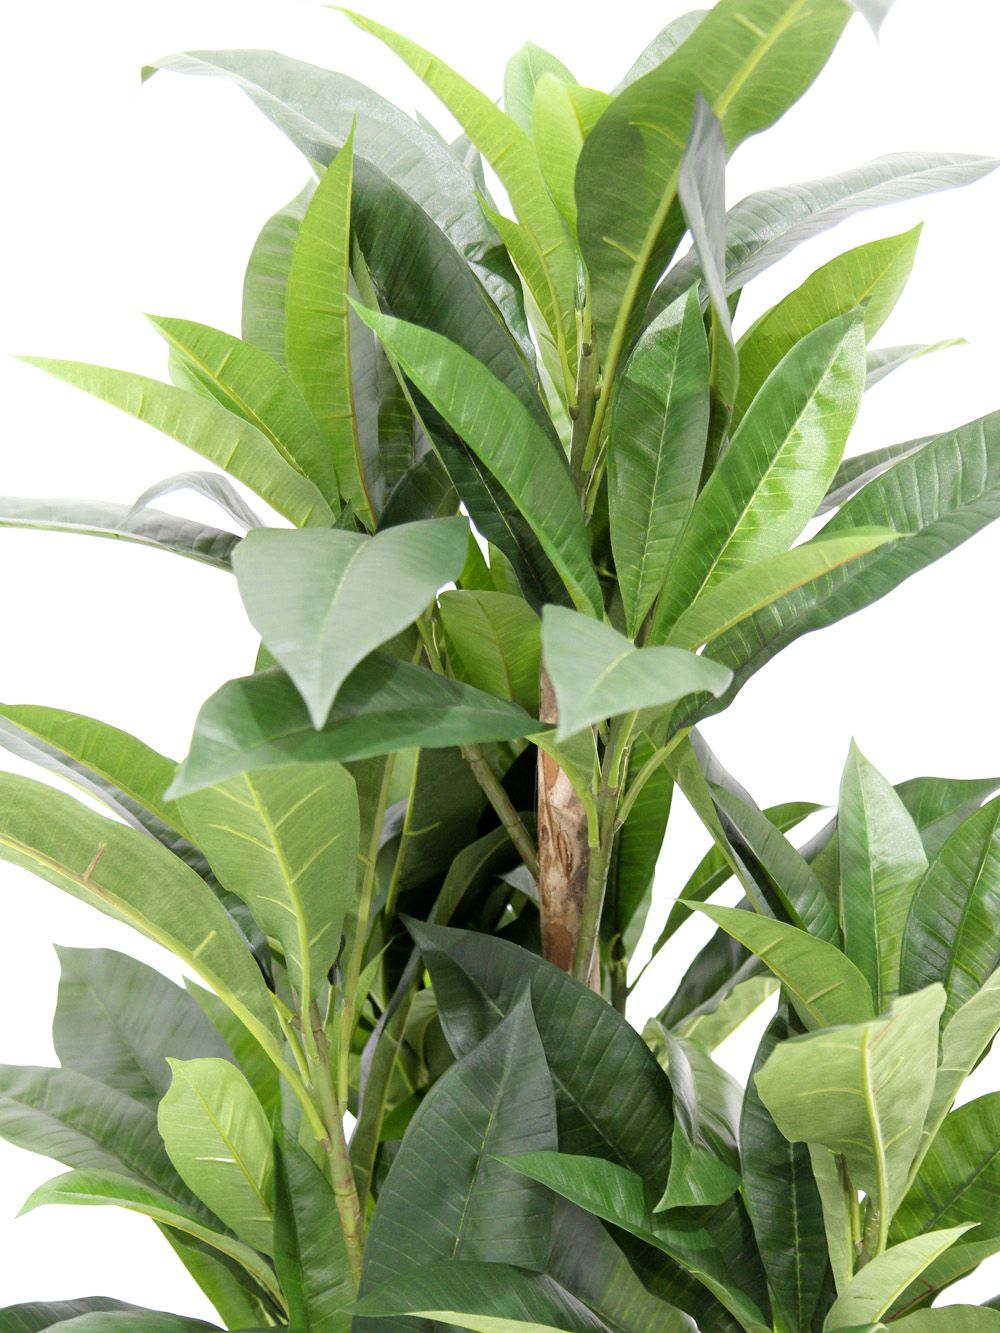 Large Leafy Green Plant Plumeria Event Prop Hire